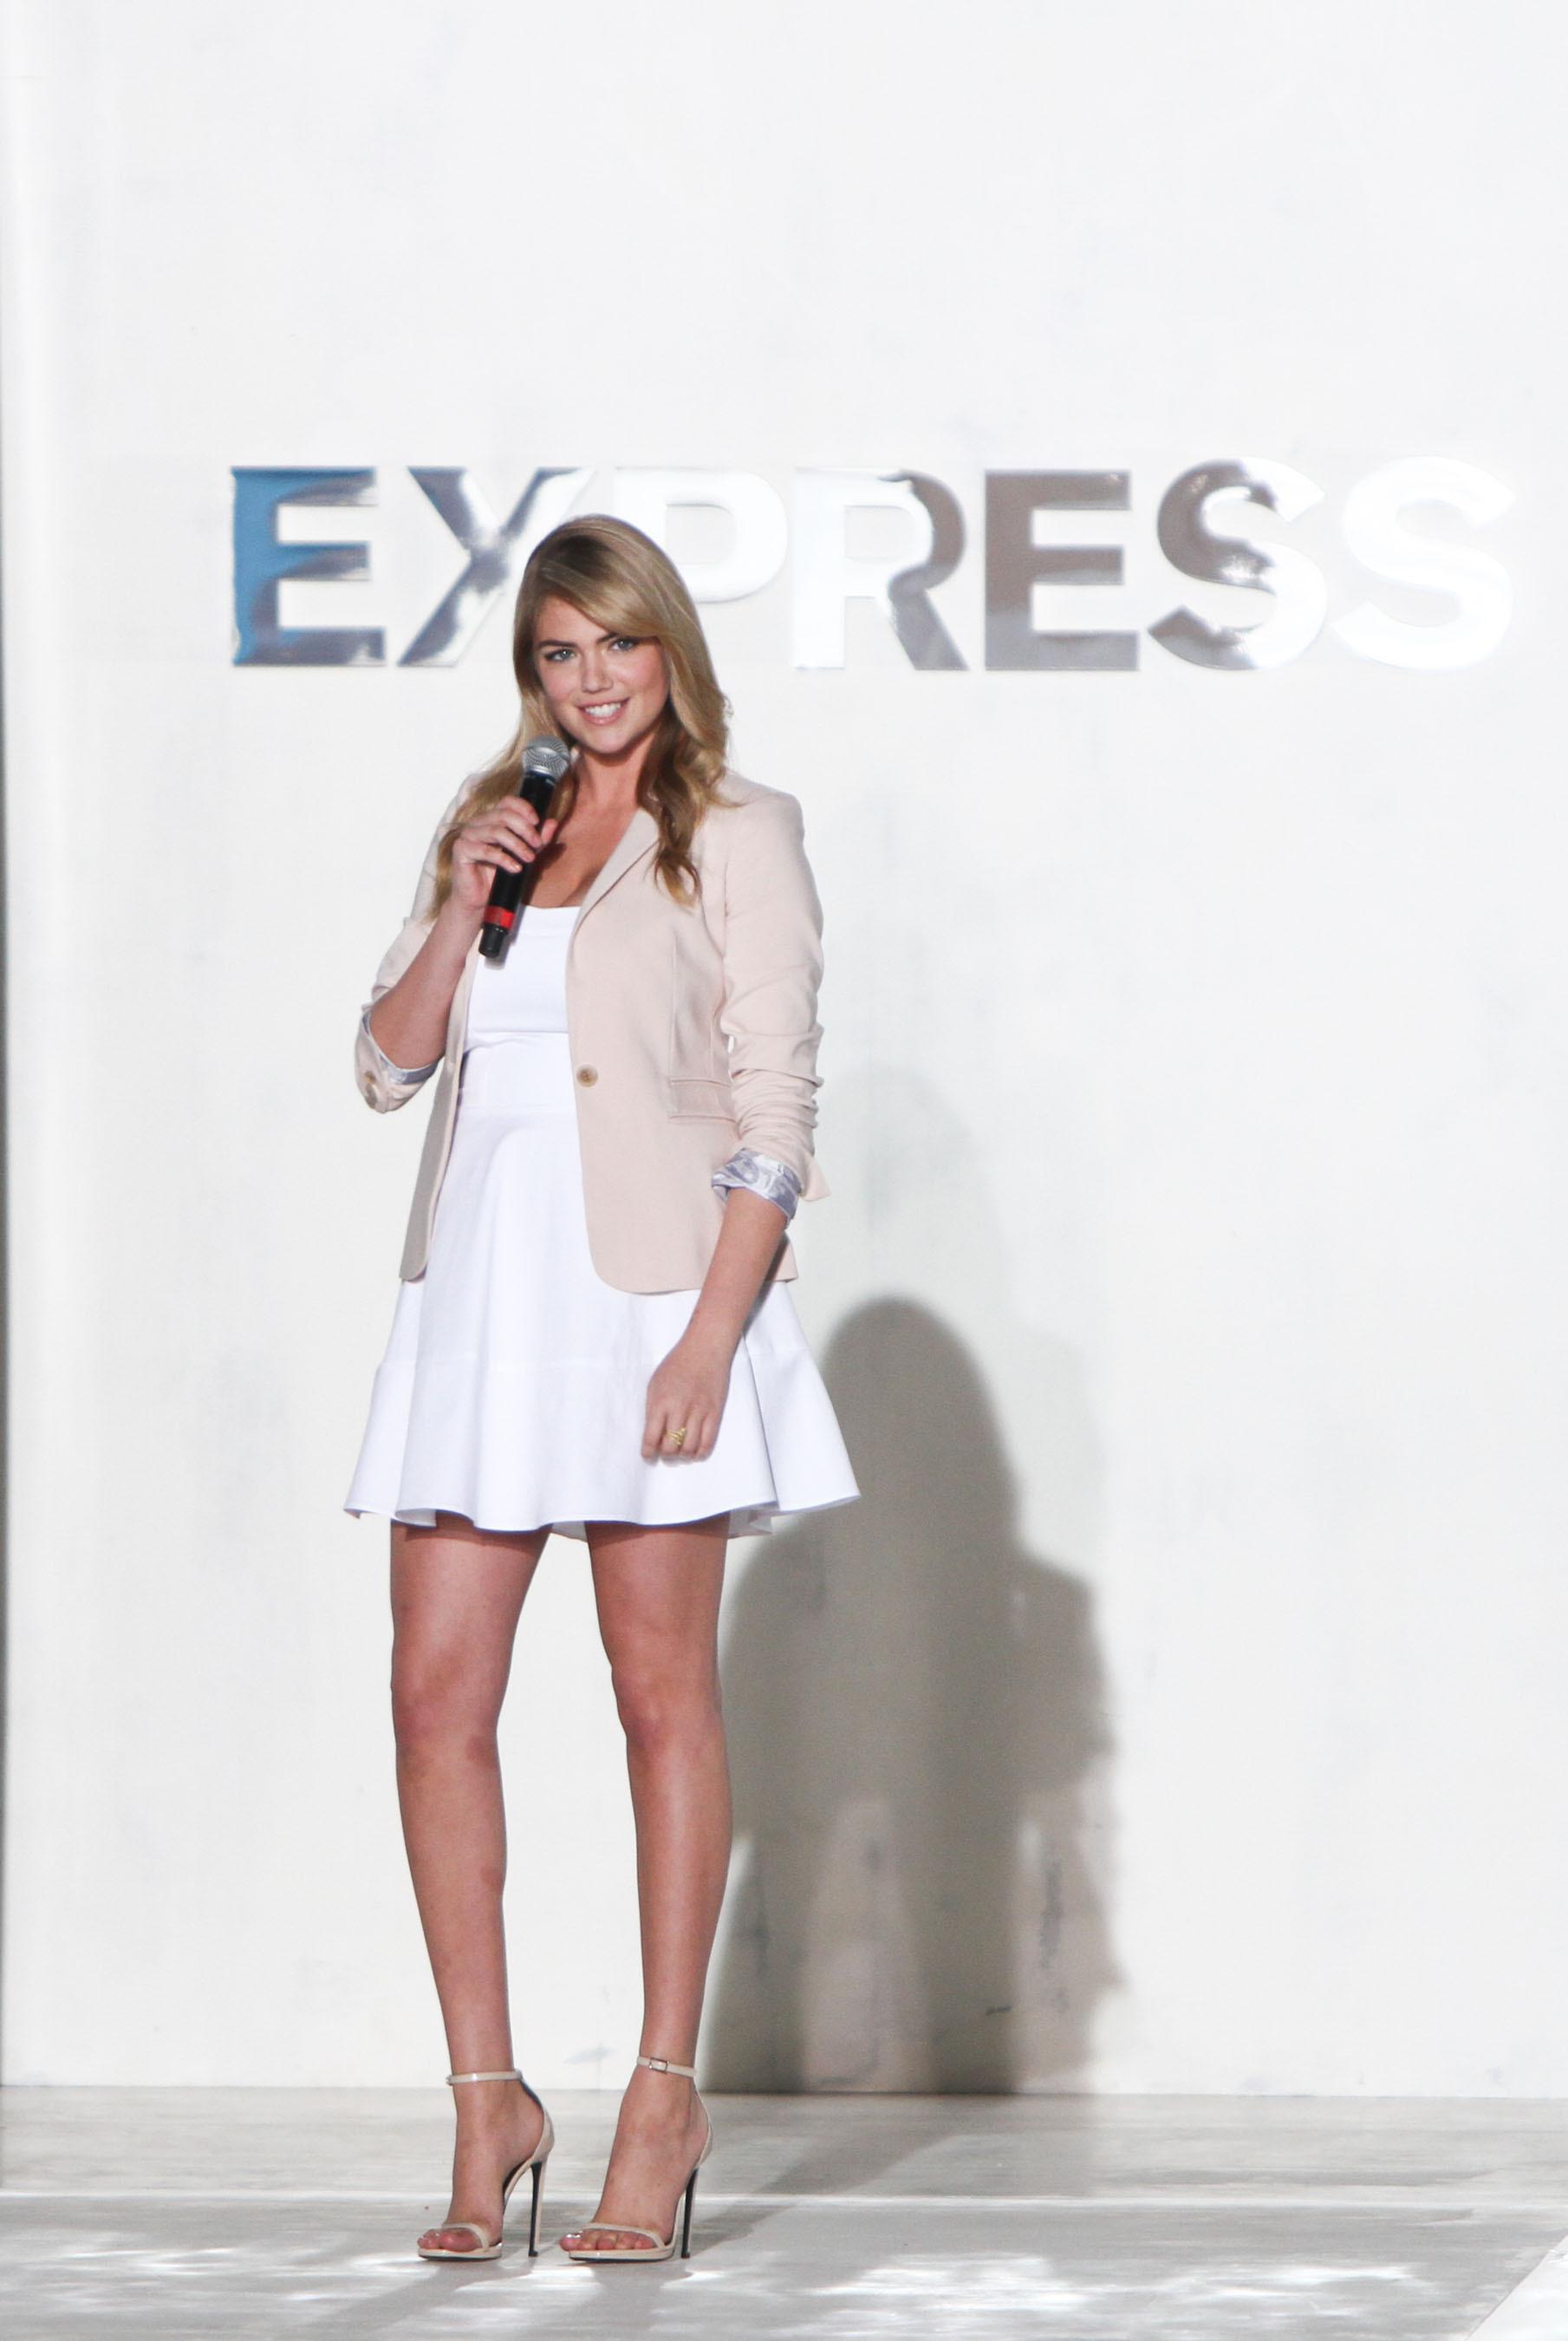 Supermodel Kate Upton hosts EXPRESS Runway Show in South Beach. (PRNewsFoto/EXPRESS, Inc.) (PRNewsFoto/EXPRESS, INC.)